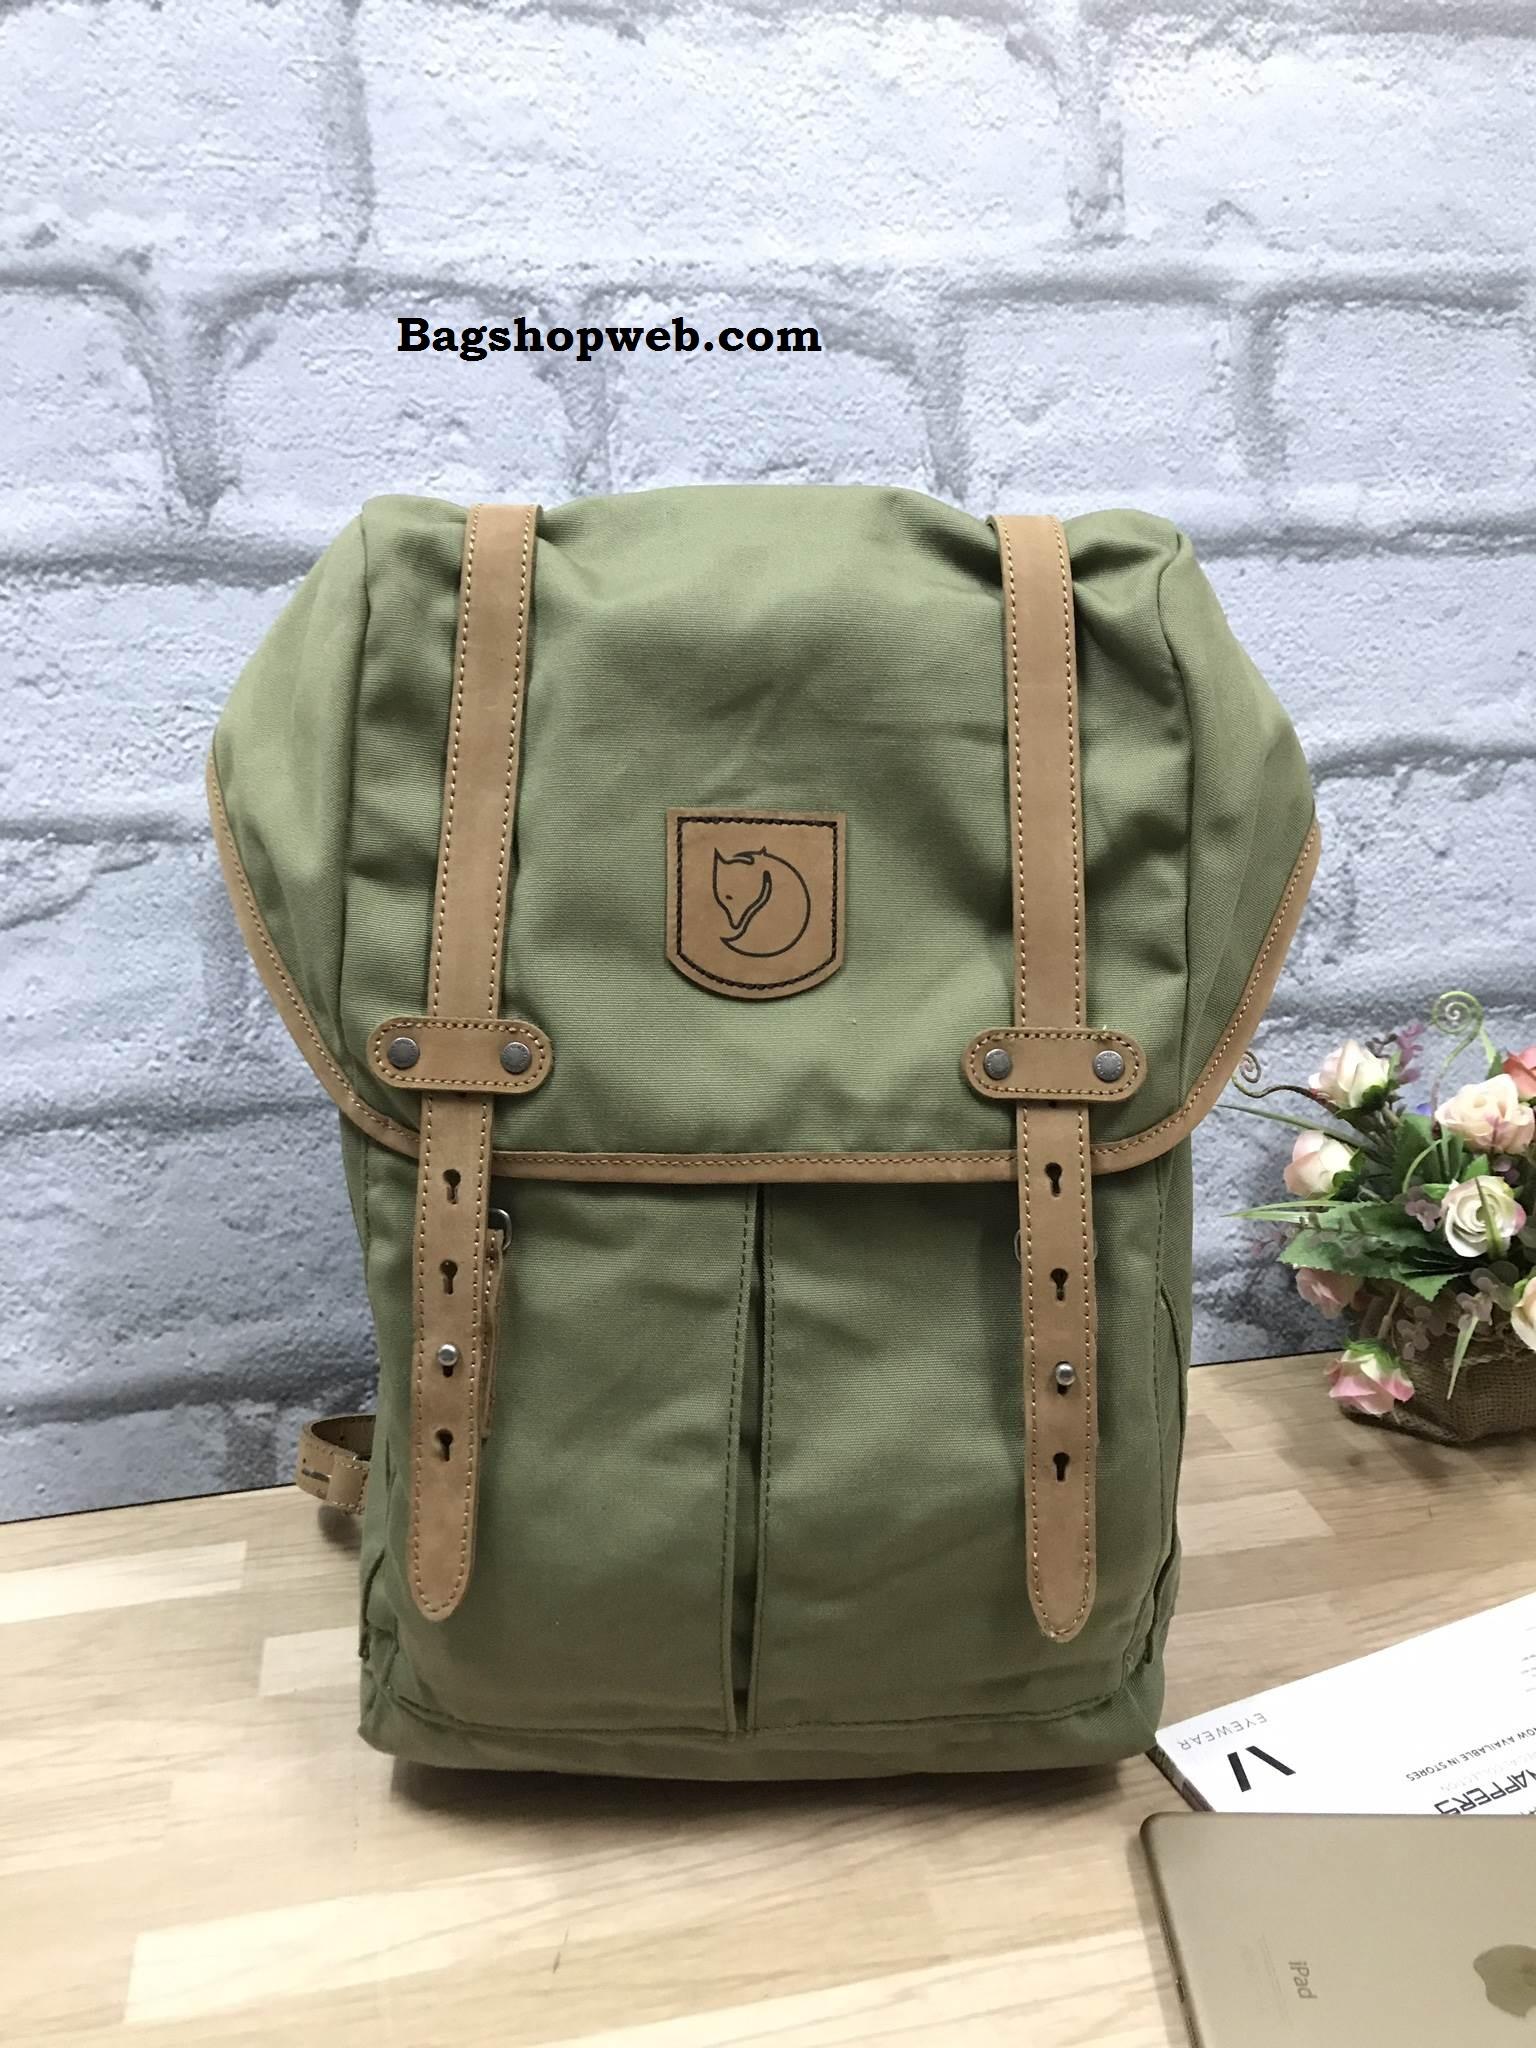 FJALL RAVEN (fertlaben) Rucksack No.21 Medium backpack